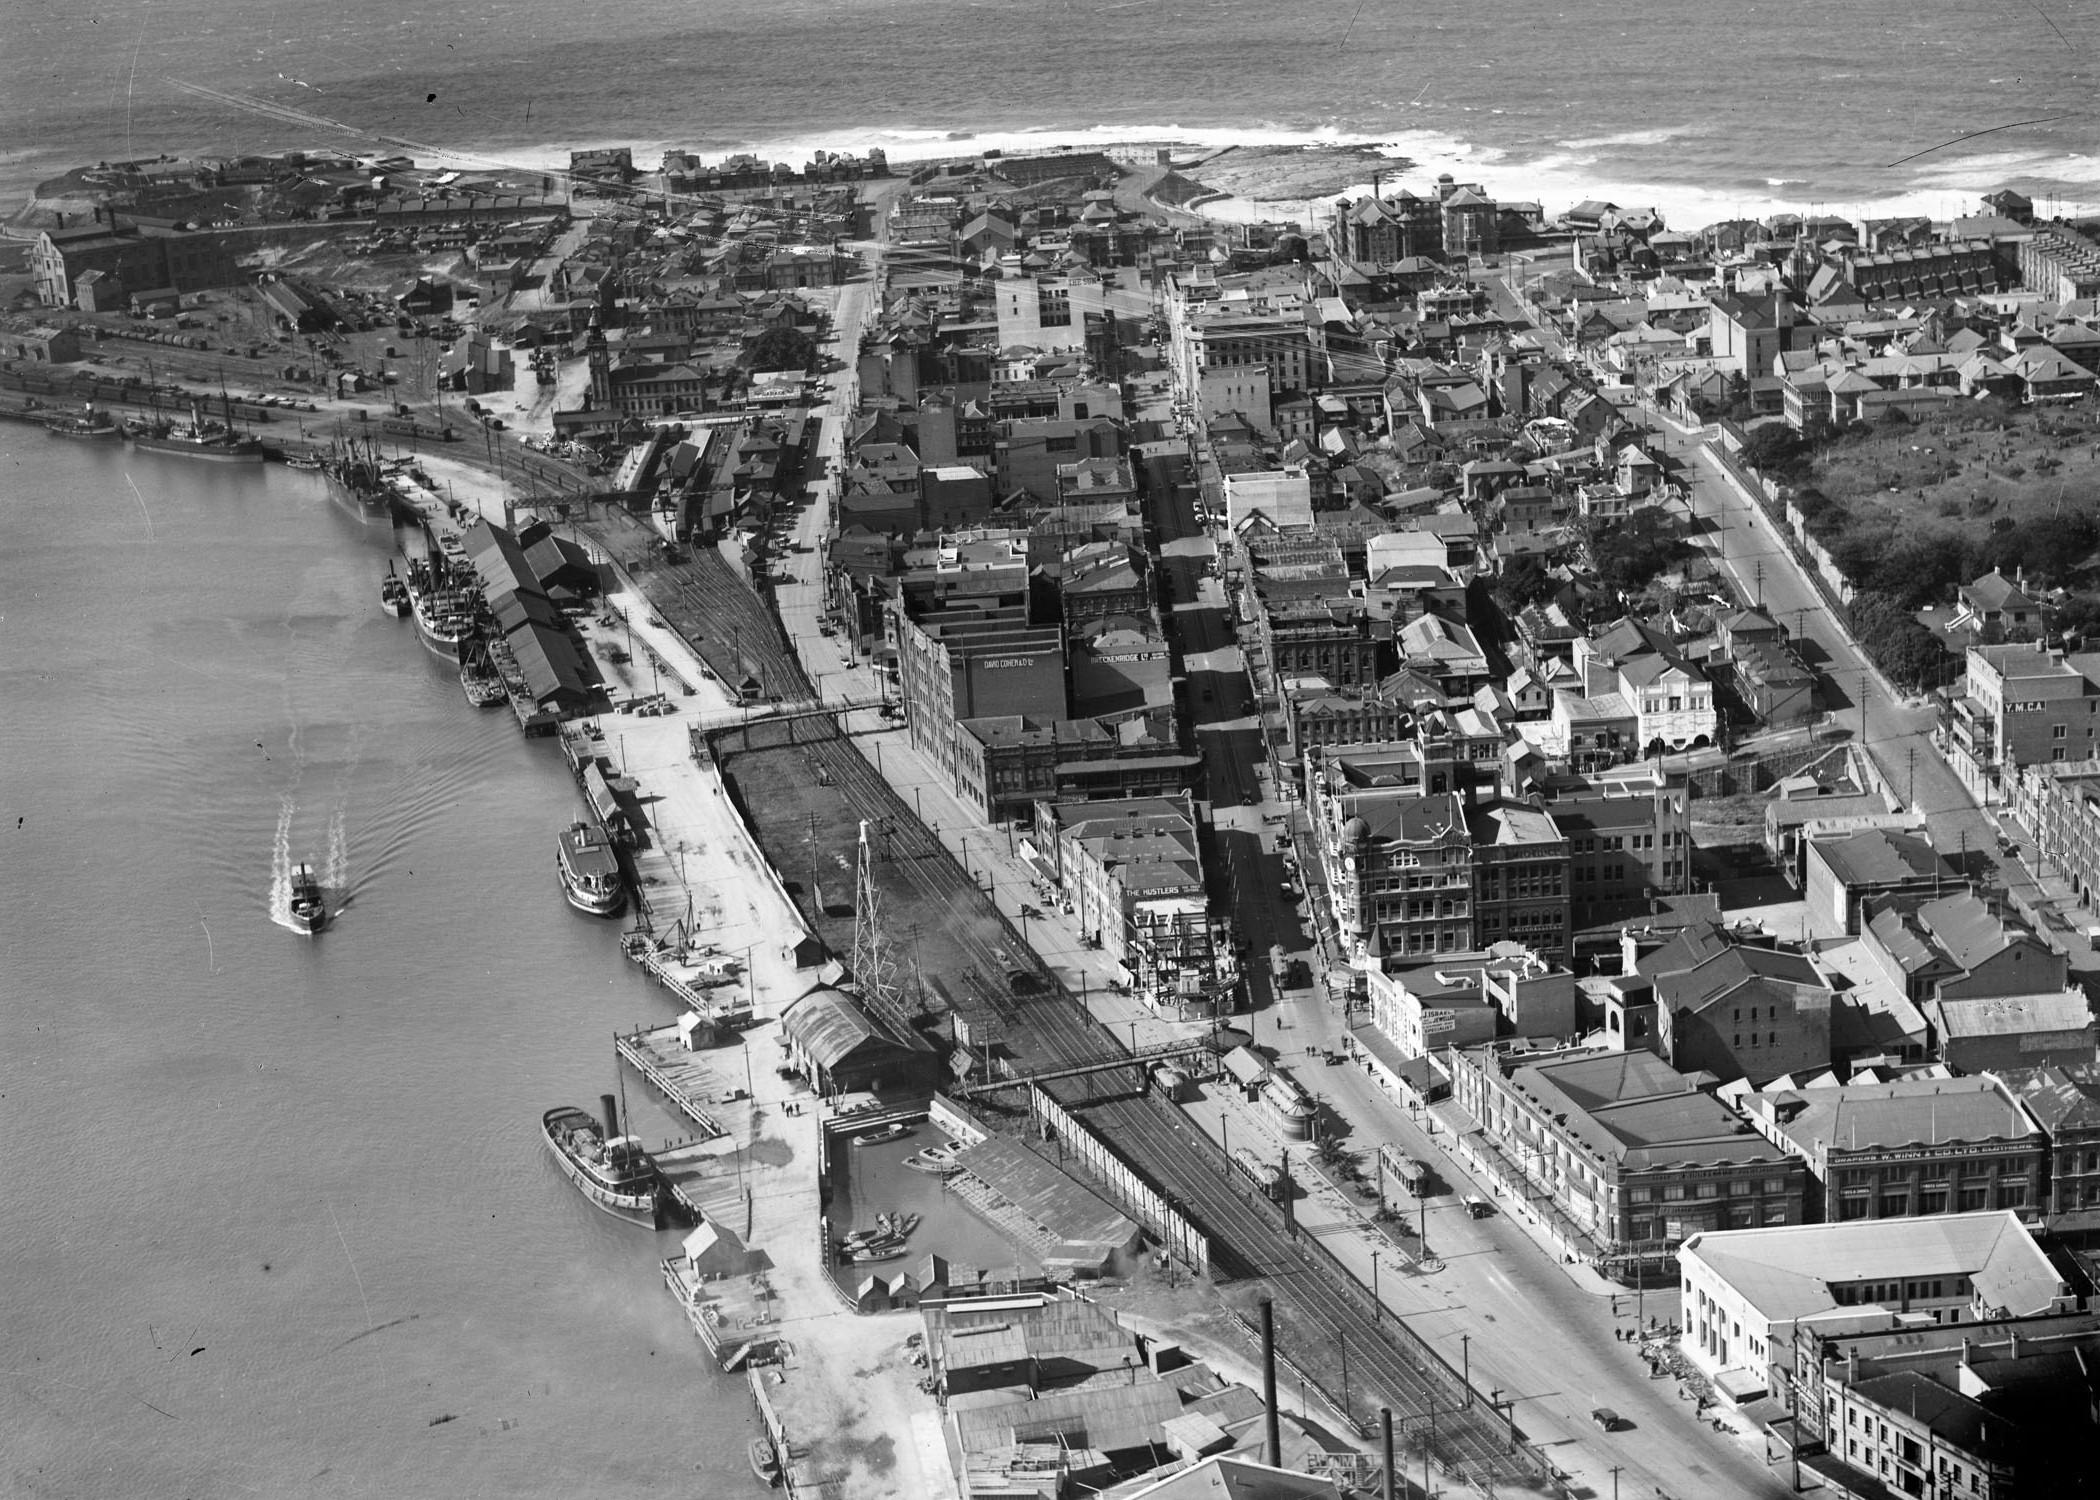 Newcastle aerial, 1935 (Image 68/13 Courtesy of Phillip Warren)